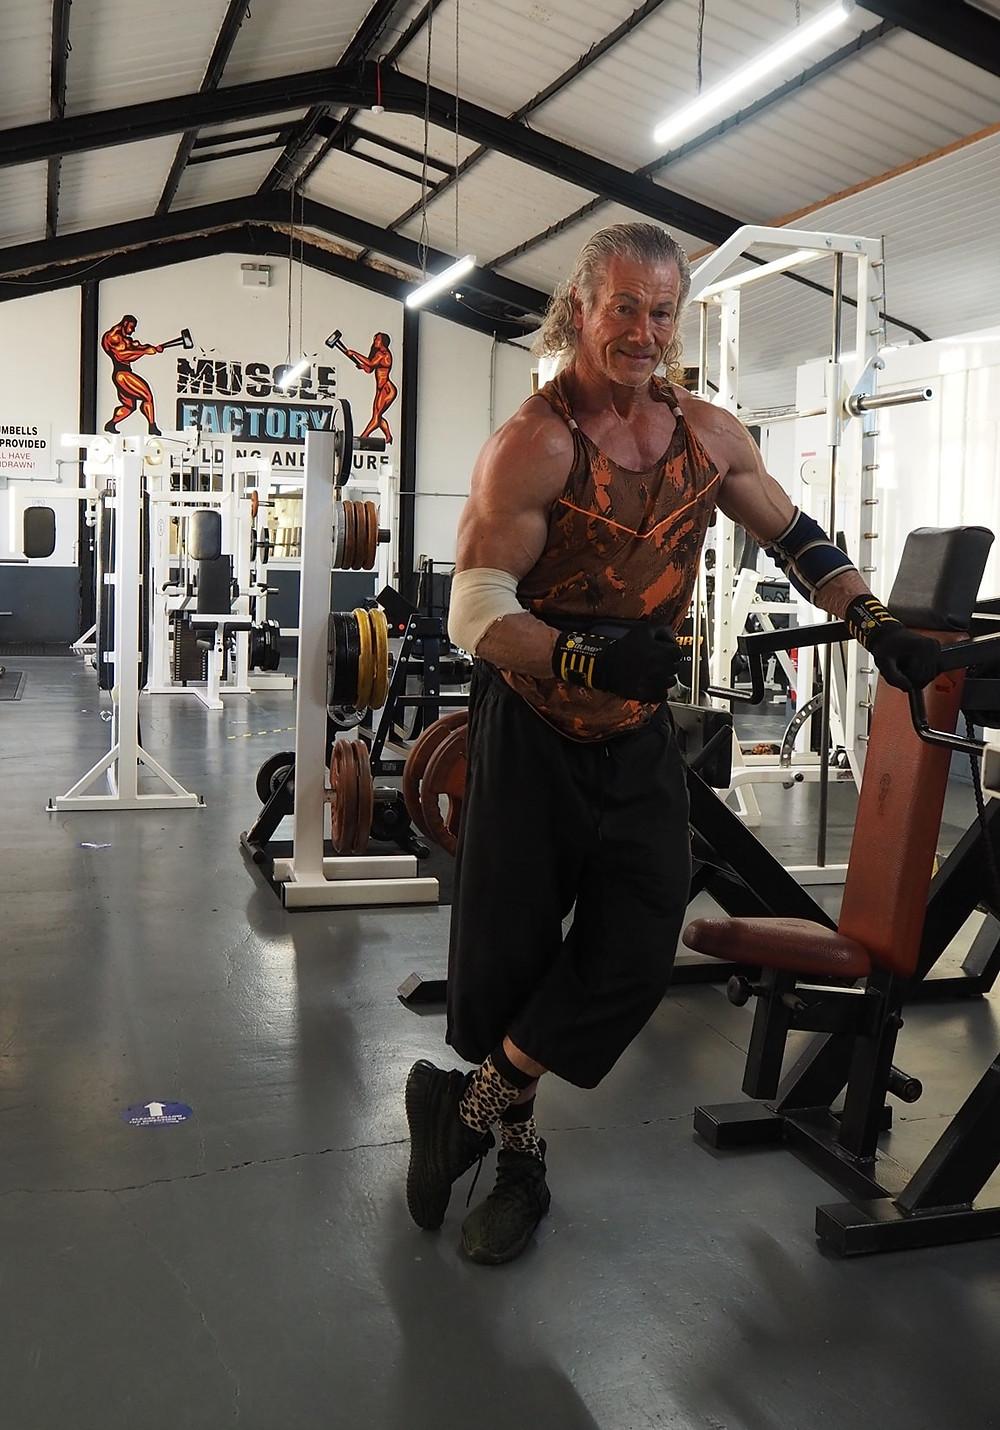 weightlifting over 60 musclefactory swinton paul xmas